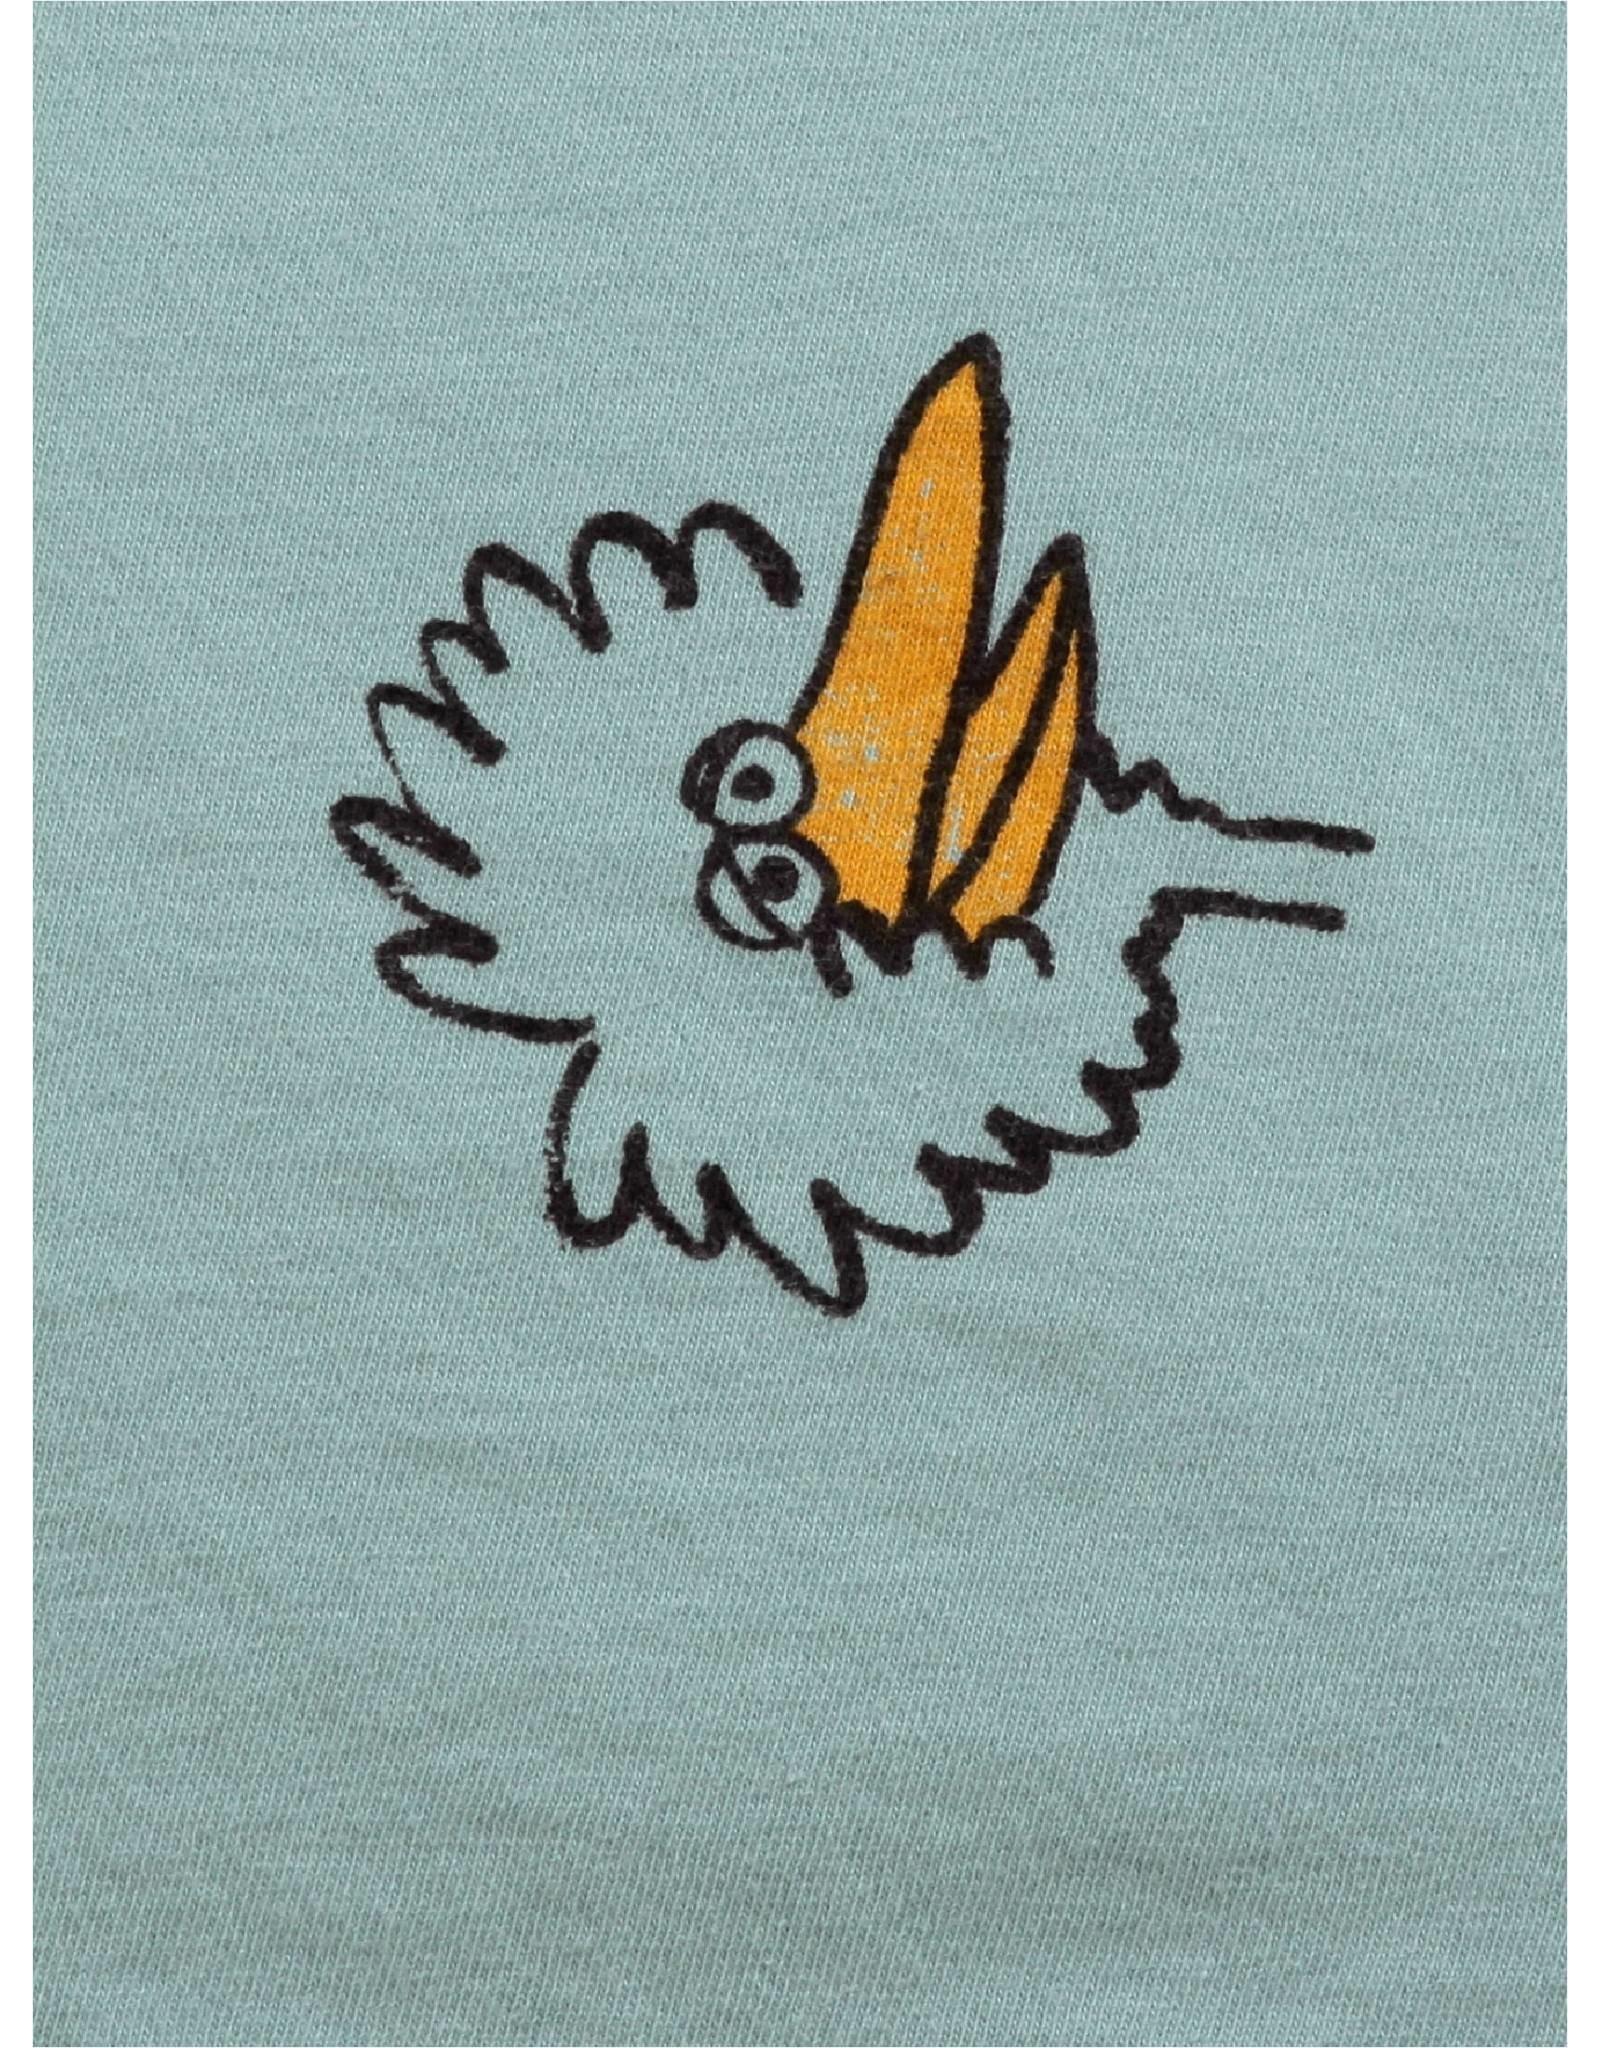 Bobo Choses Bobo Choses Birdie All Over Long Sleeve T-s @